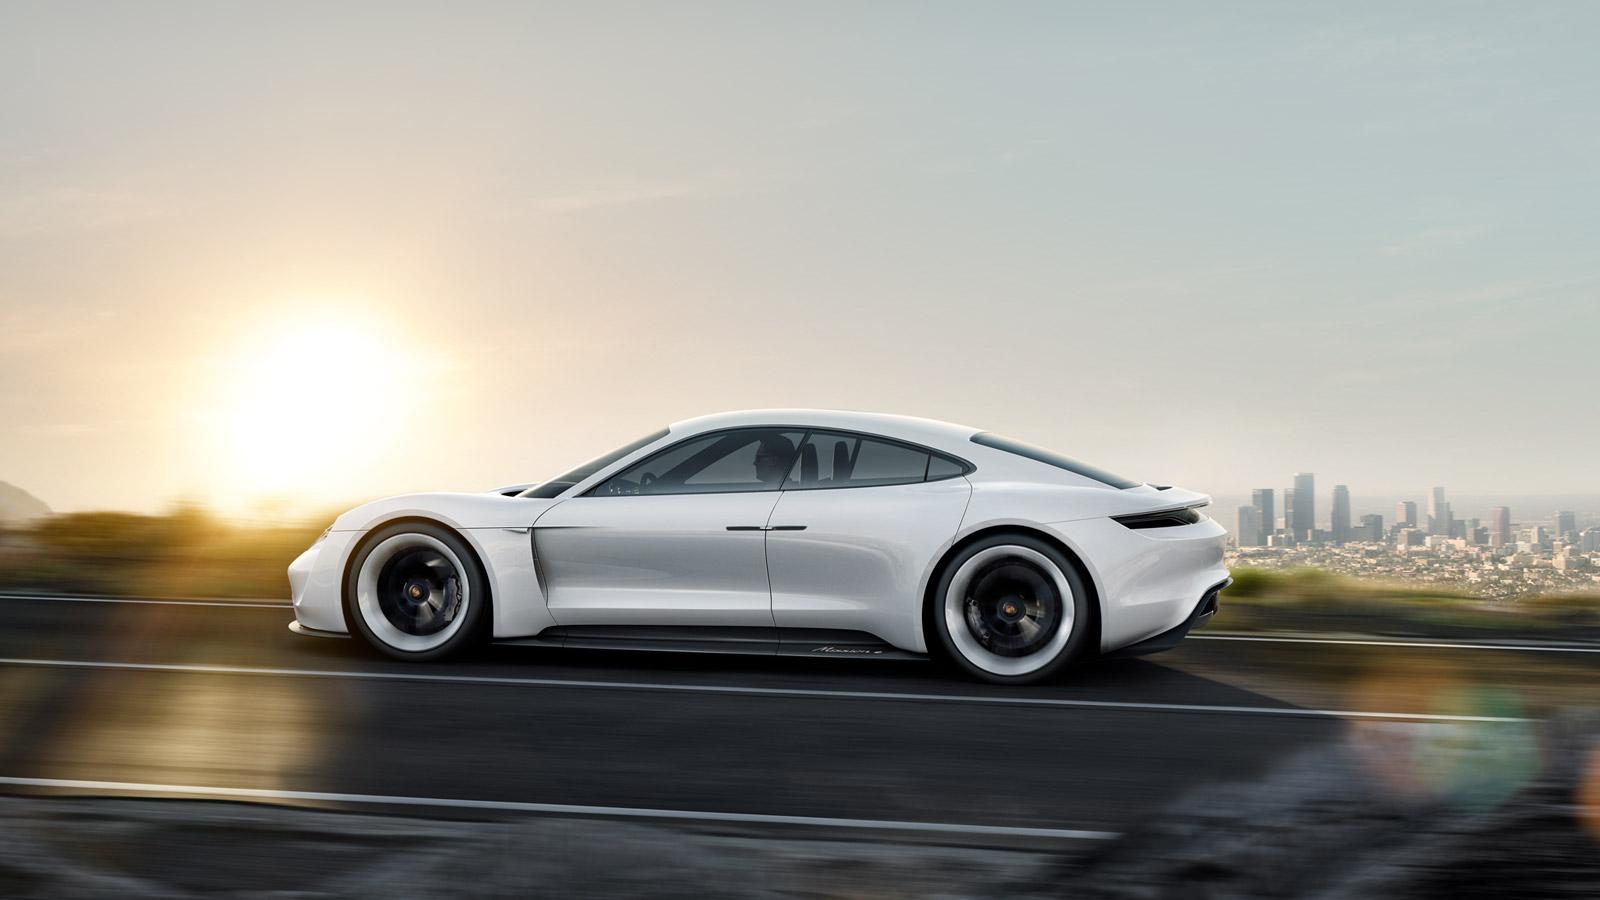 Images Of A Bentley Car Wallpaper Porsche S Mission E Concept Car Electrifies Frankfurt